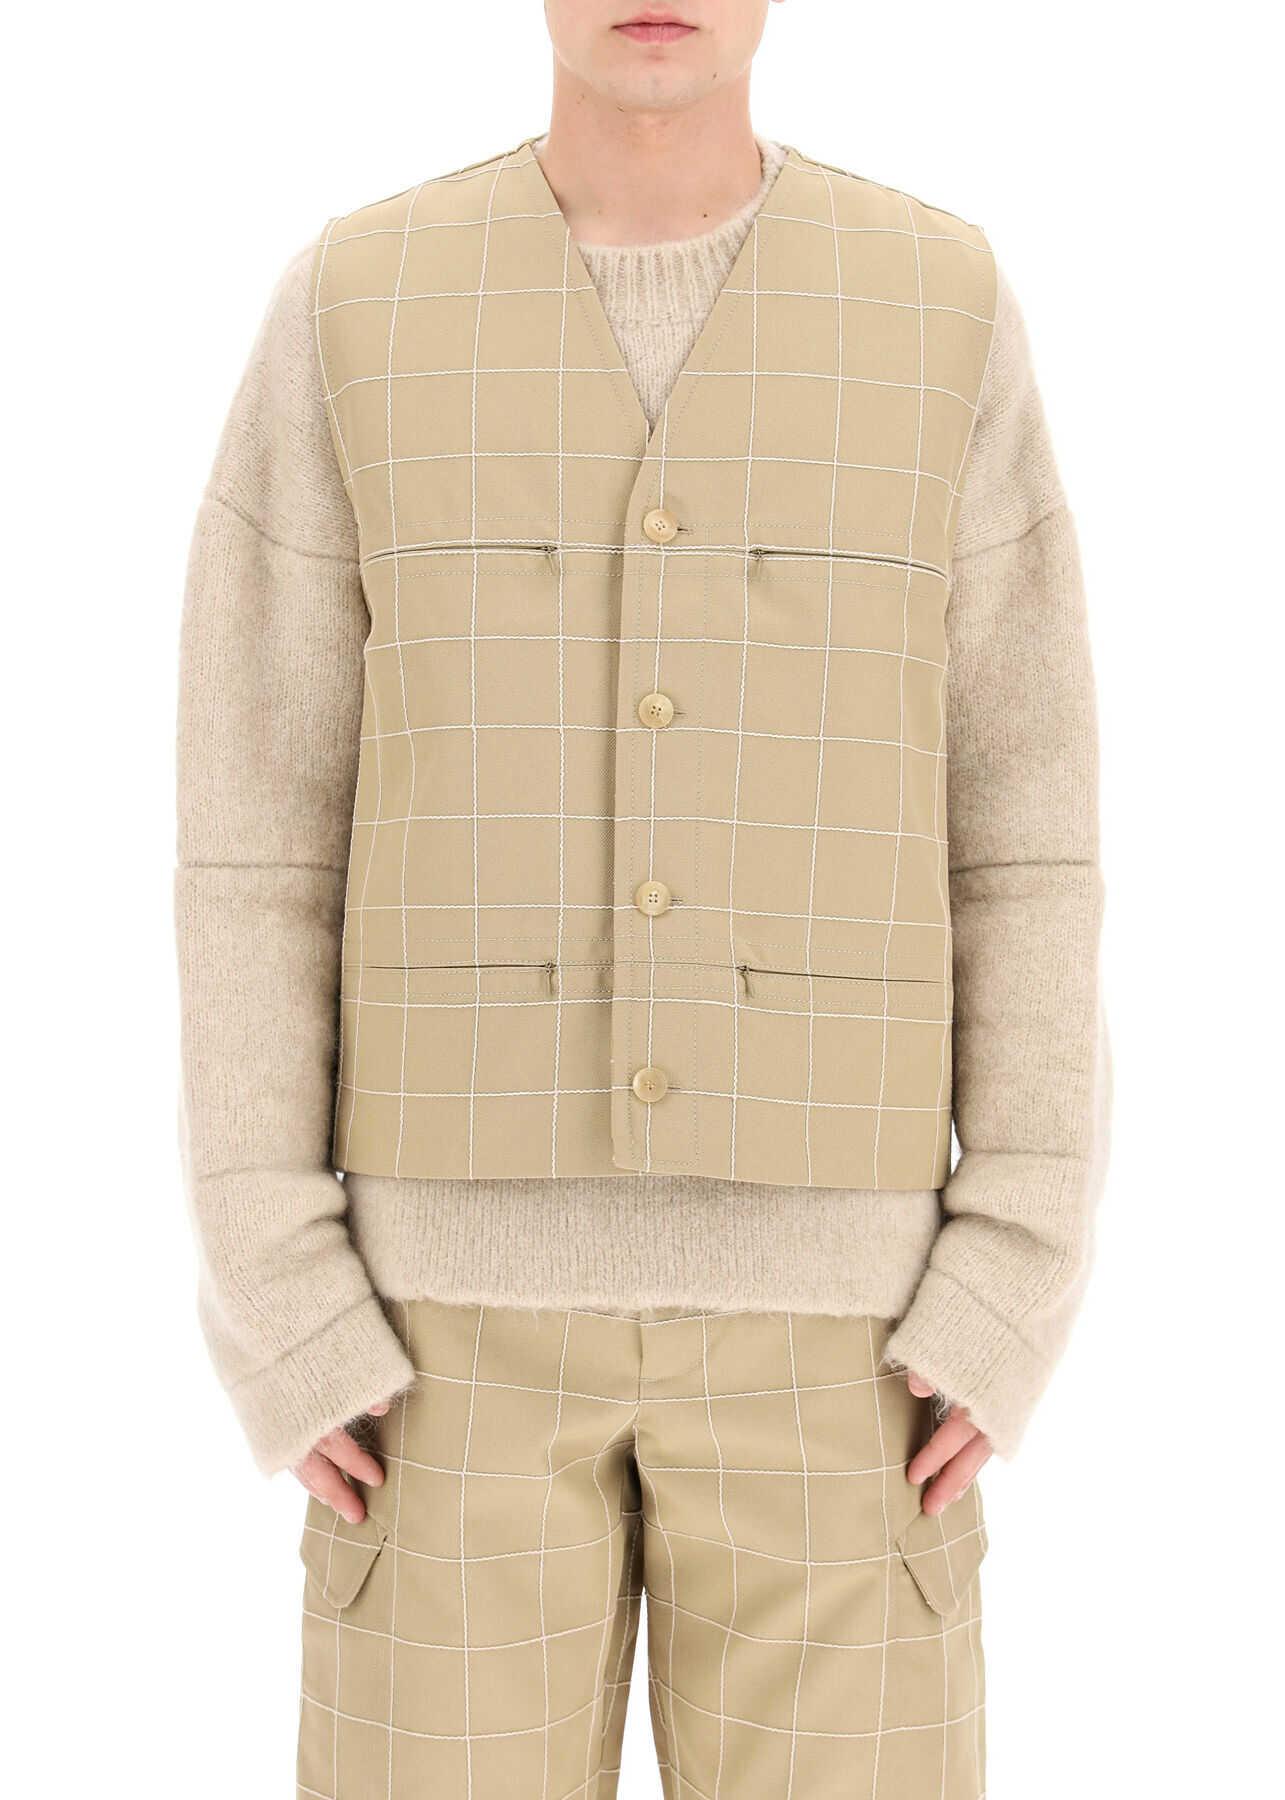 JACQUEMUS Embroidered Check Vest BEIGE CHECK imagine